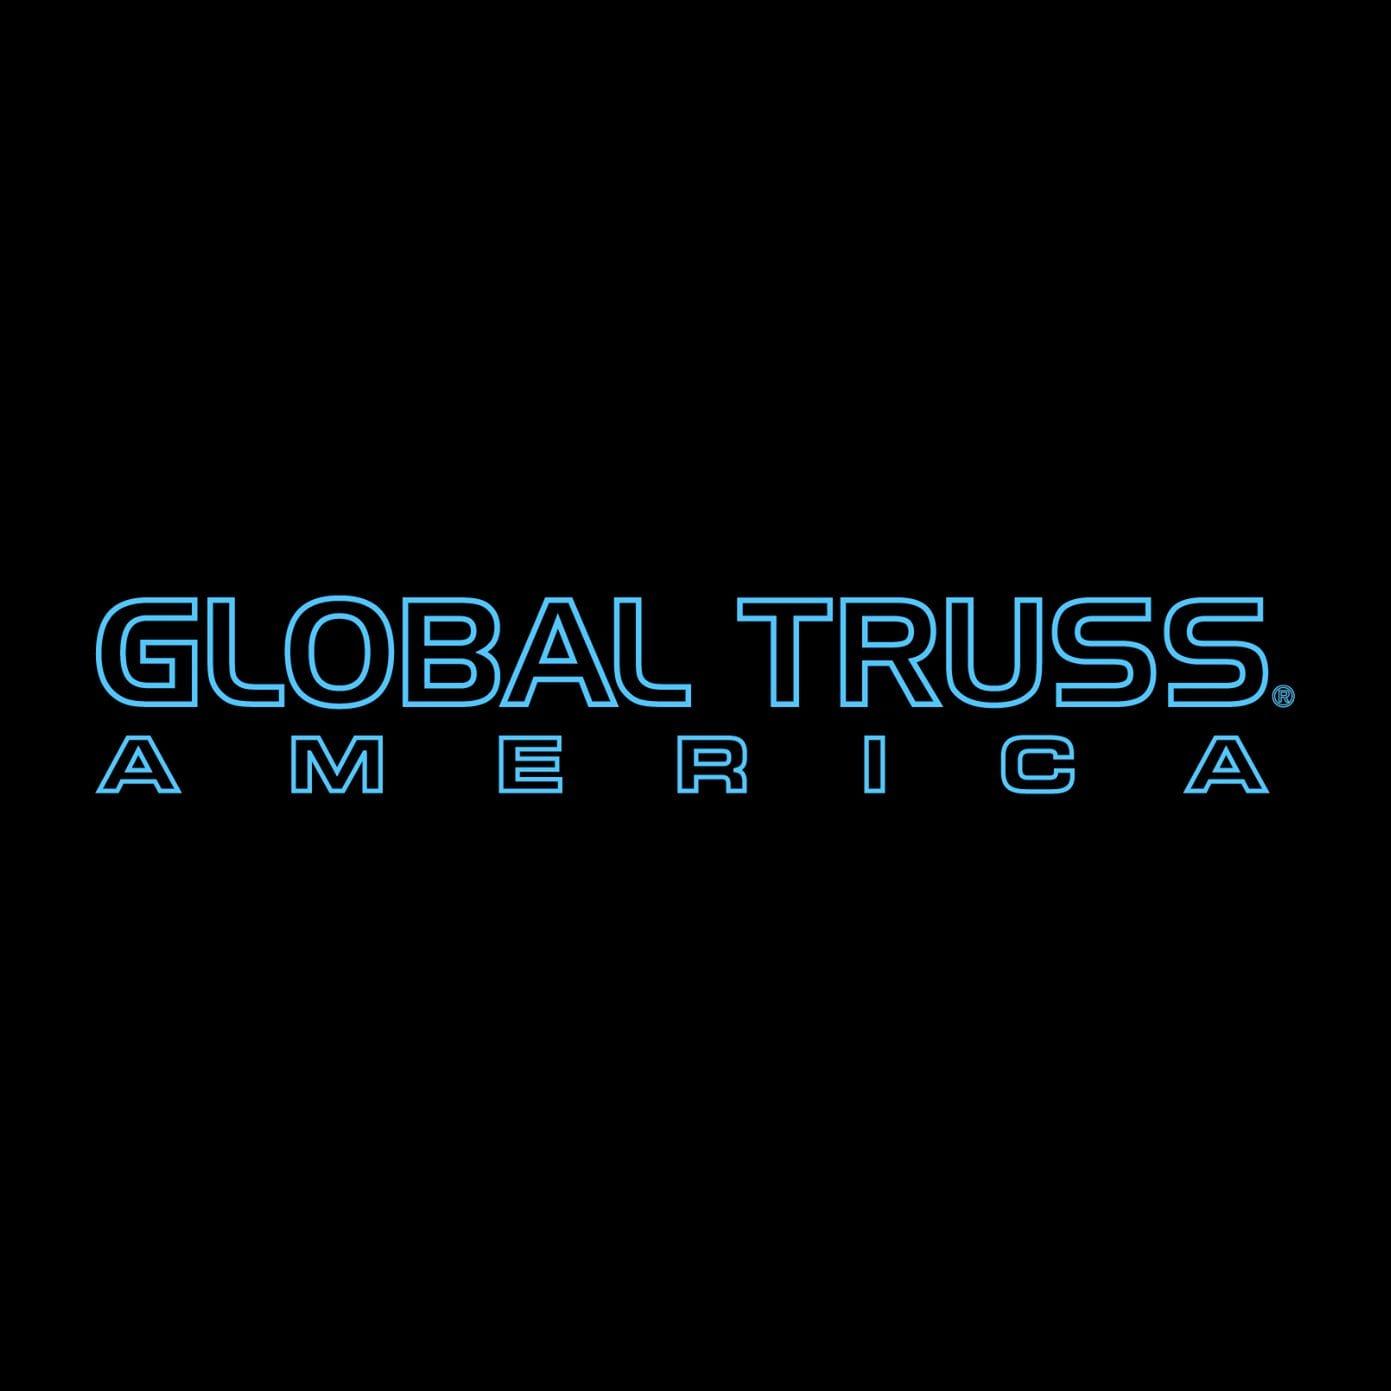 Global Truss DJ Expo